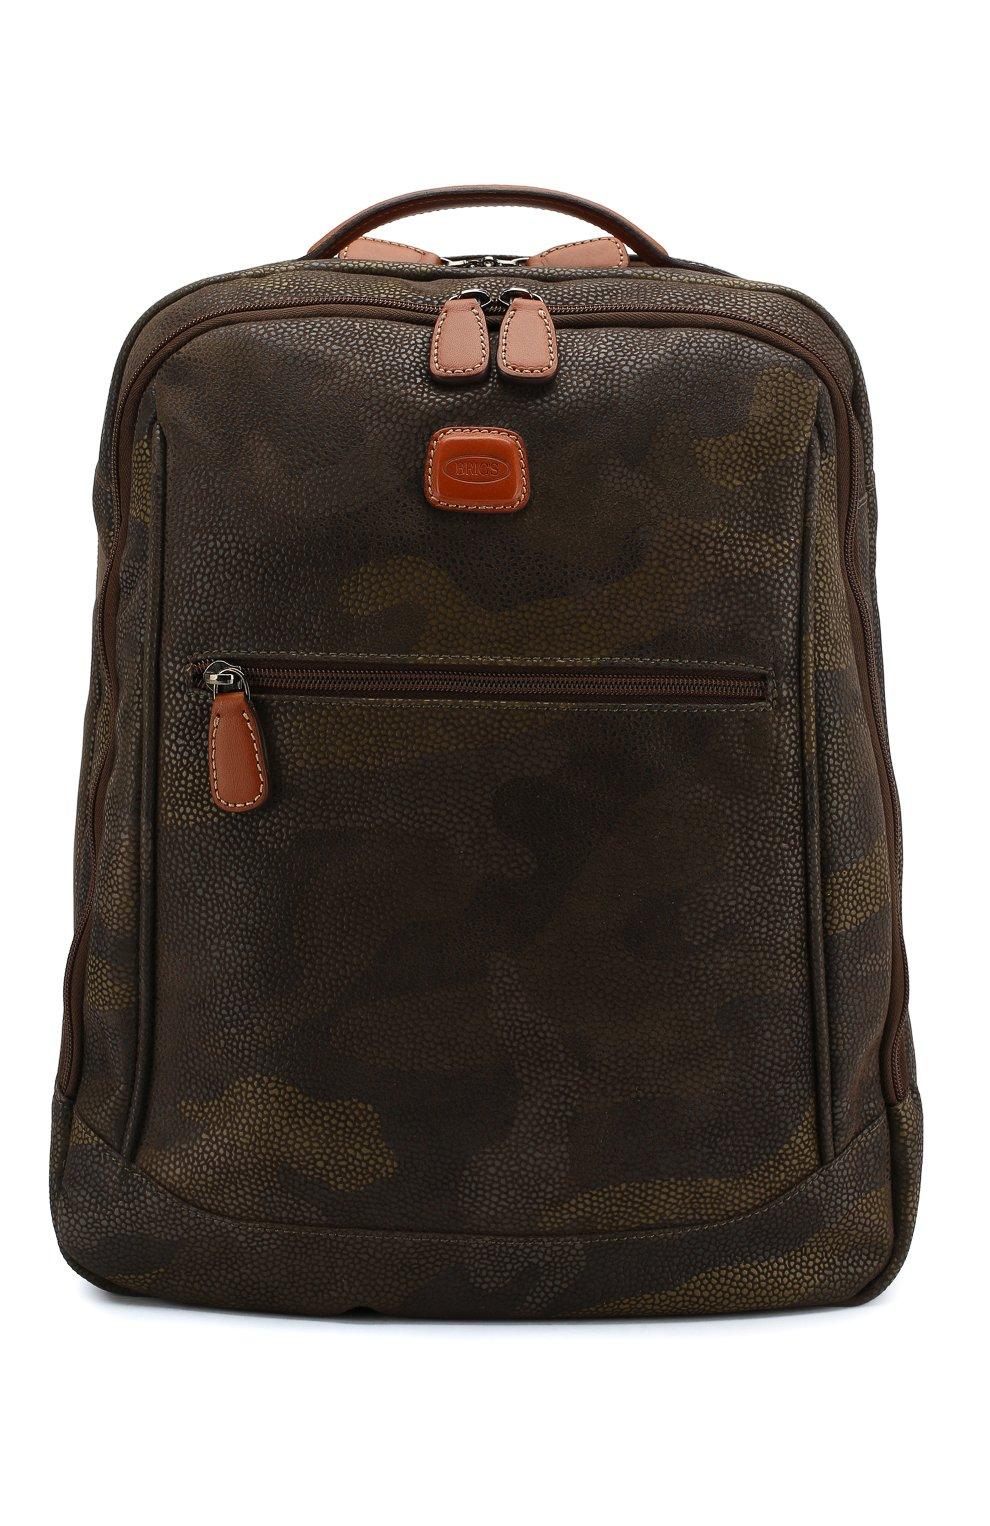 Женский дорожный рюкзак life BRIC`S оливкового цвета, арт. BL8 04658 | Фото 1